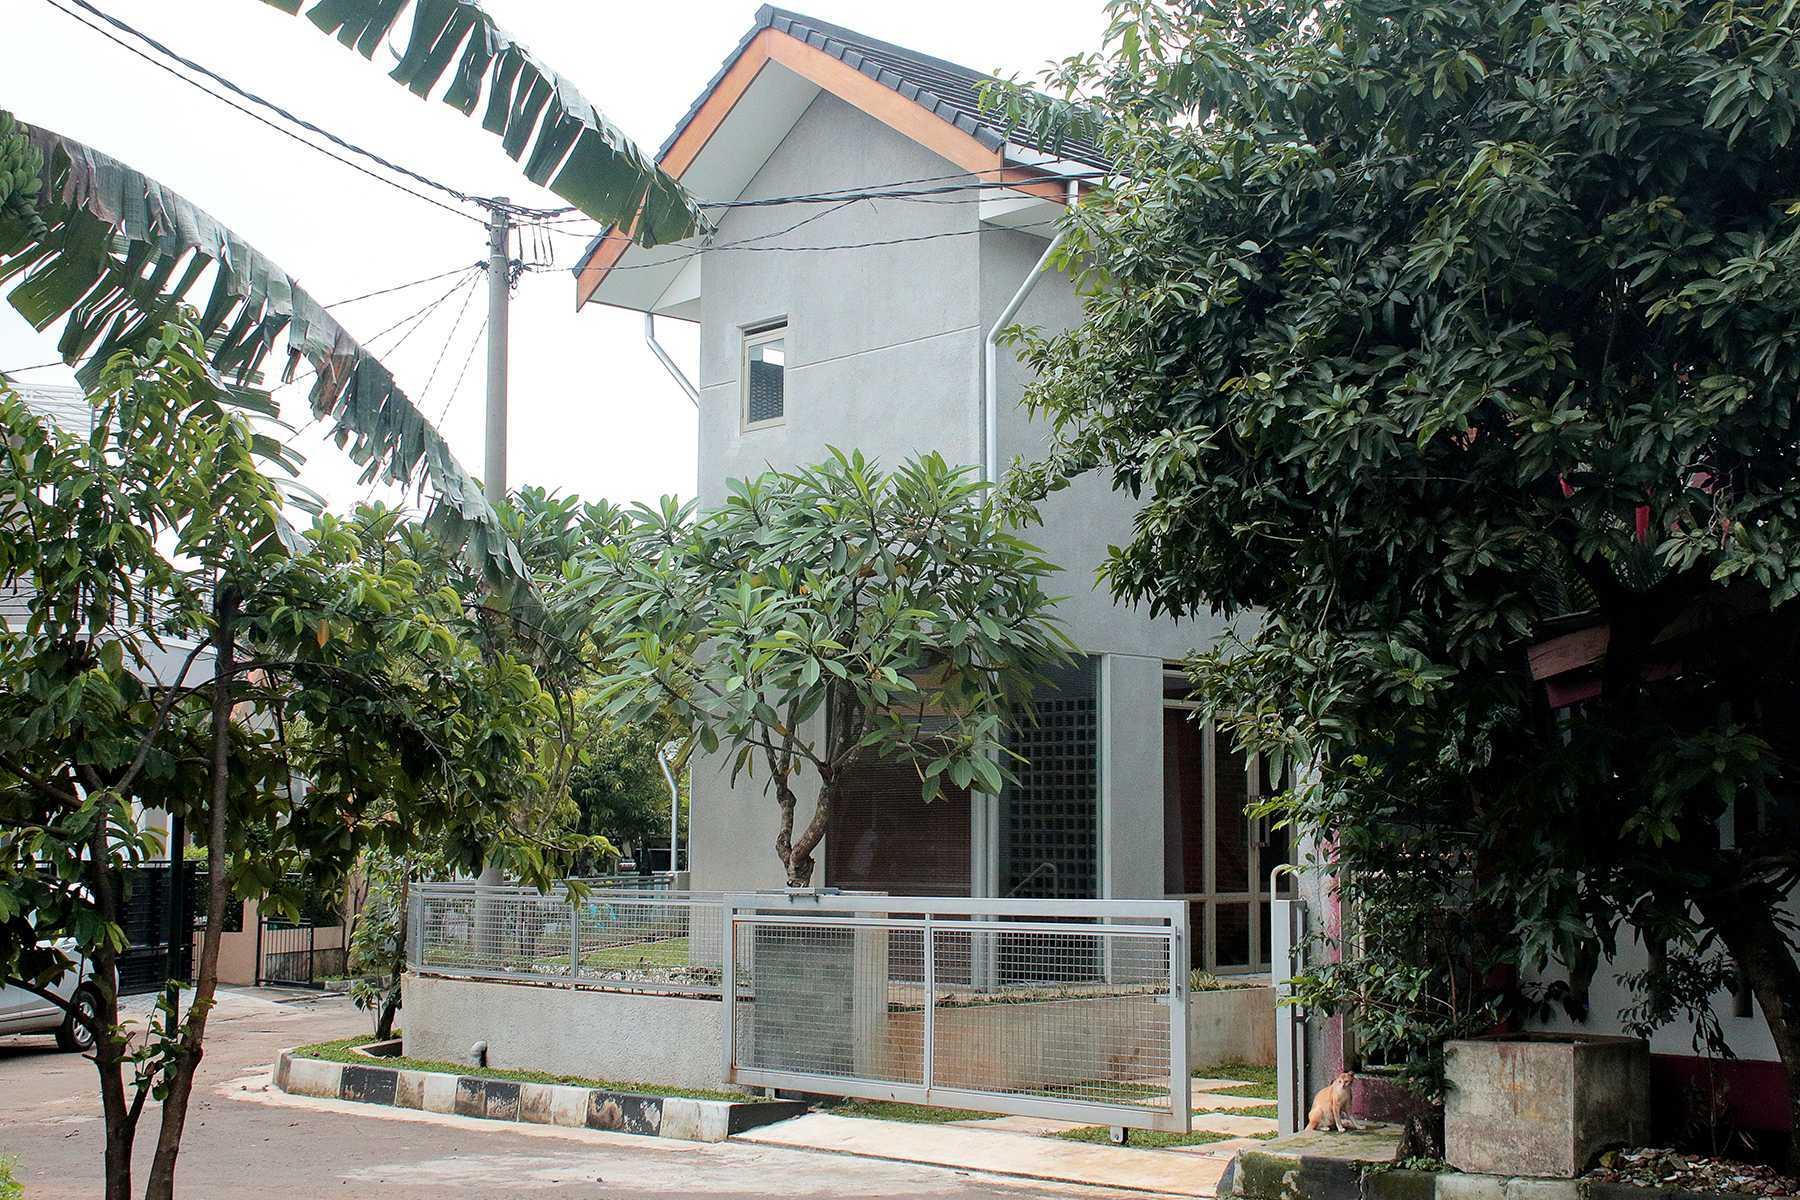 Lukie Widya - Luwist Spatial E+D House Bogor, West Java, Indonesia Bogor, West Java, Indonesia Img9323E   31128